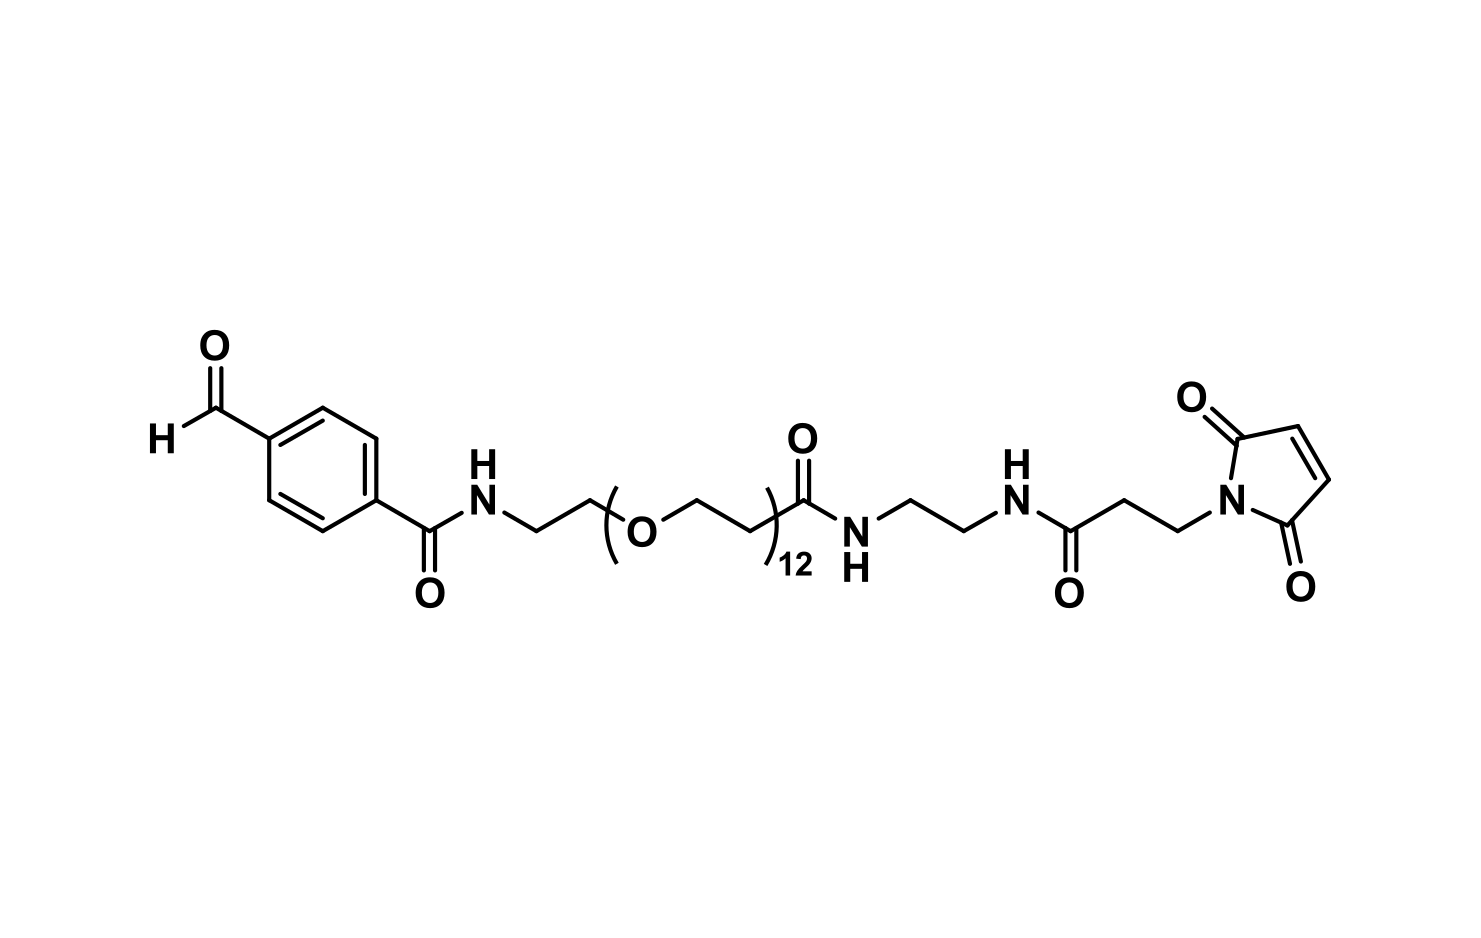 4-formyl-benzamido-dPEG®₁₂-EDA-MAL